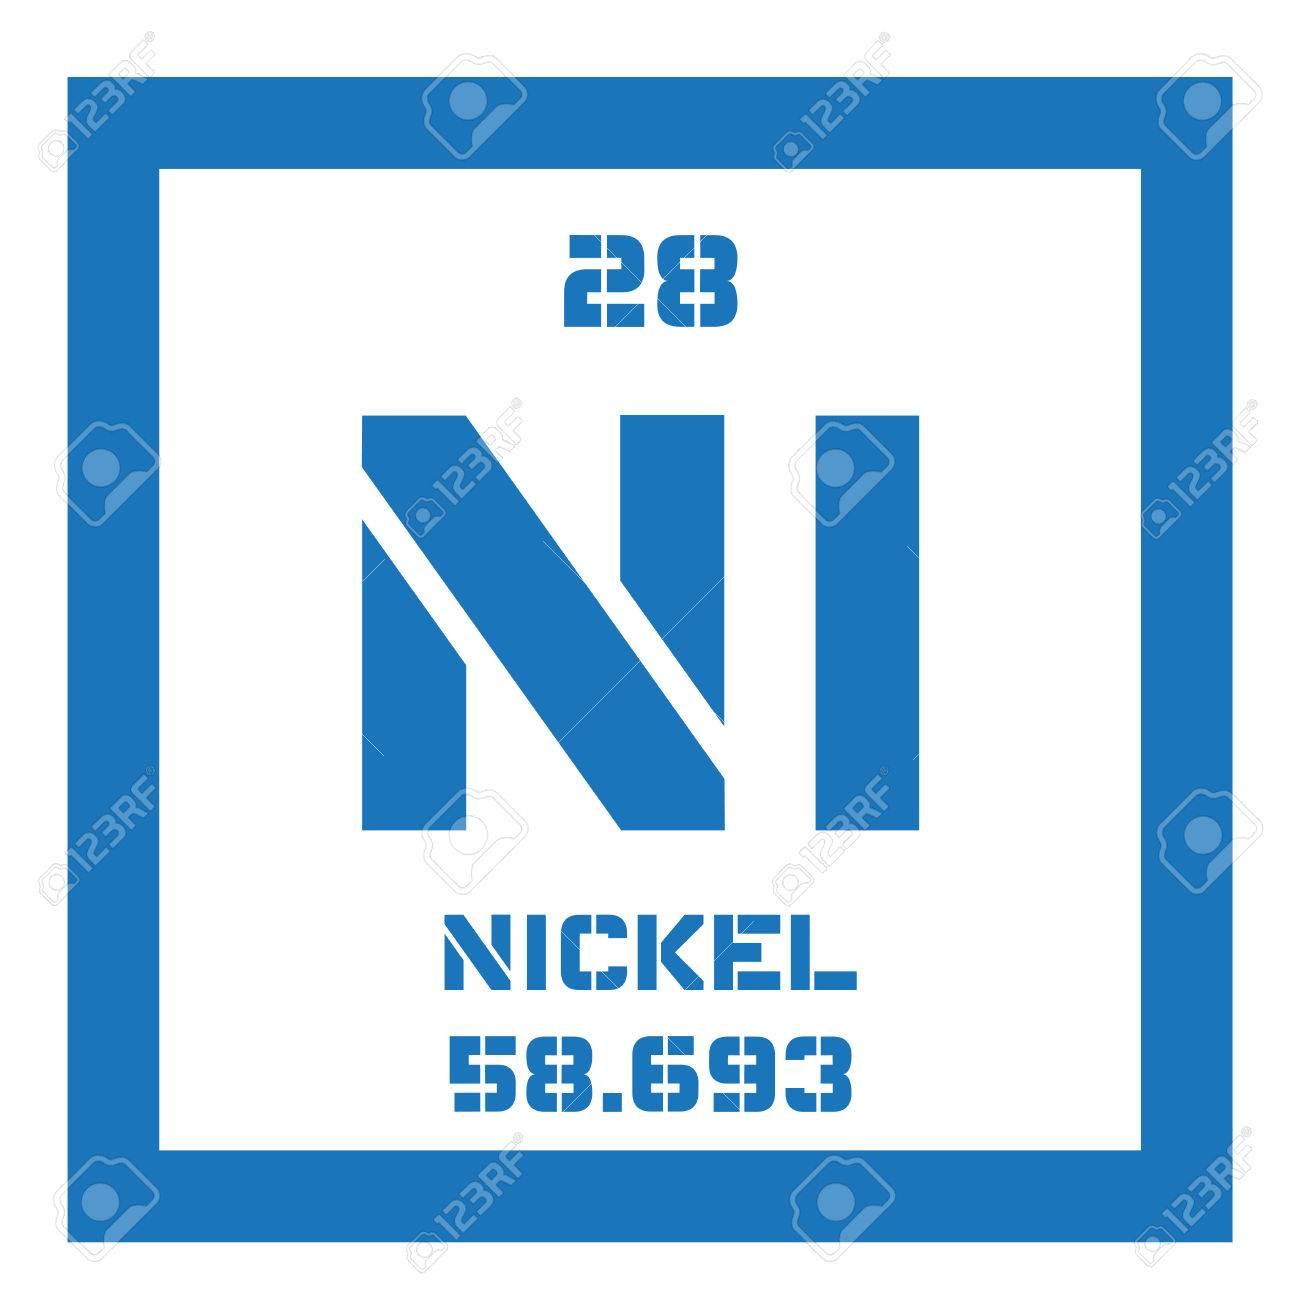 Nickel chemical element transition metal colored icon with nickel chemical element transition metal colored icon with atomic number and atomic weight buycottarizona Images